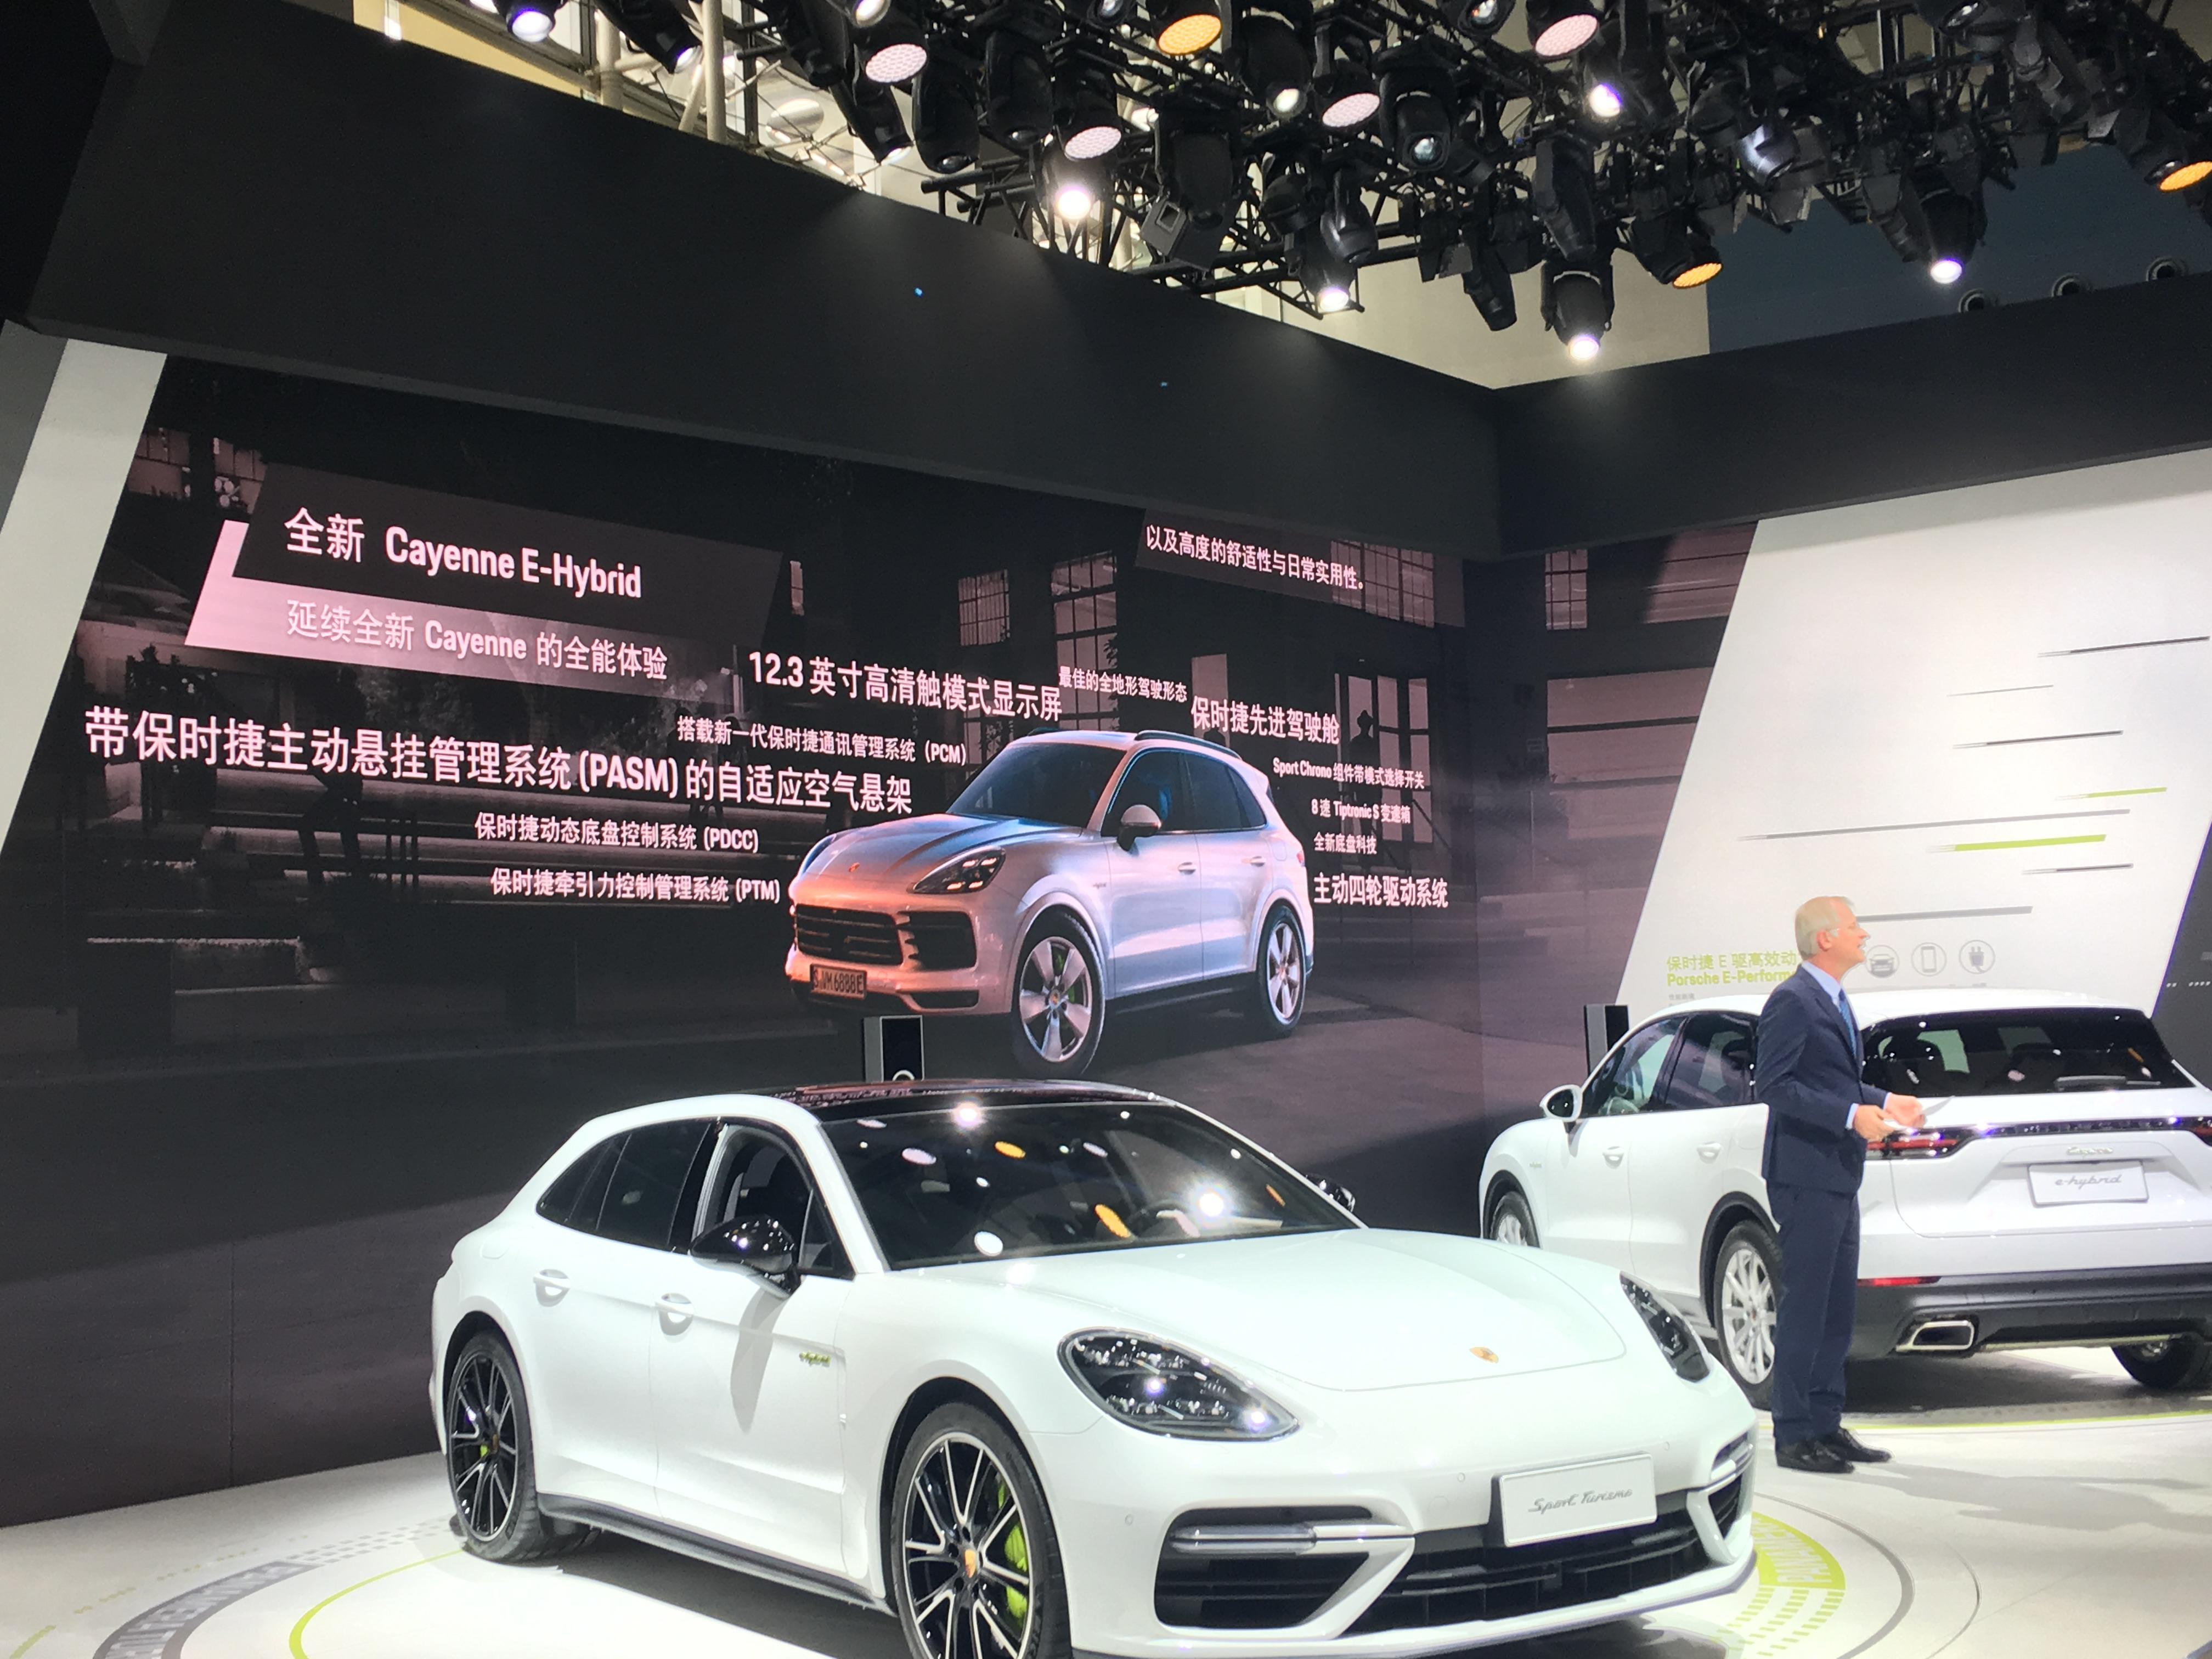 2.0T+电动机 保时捷Cayenne E-Hybrid上市